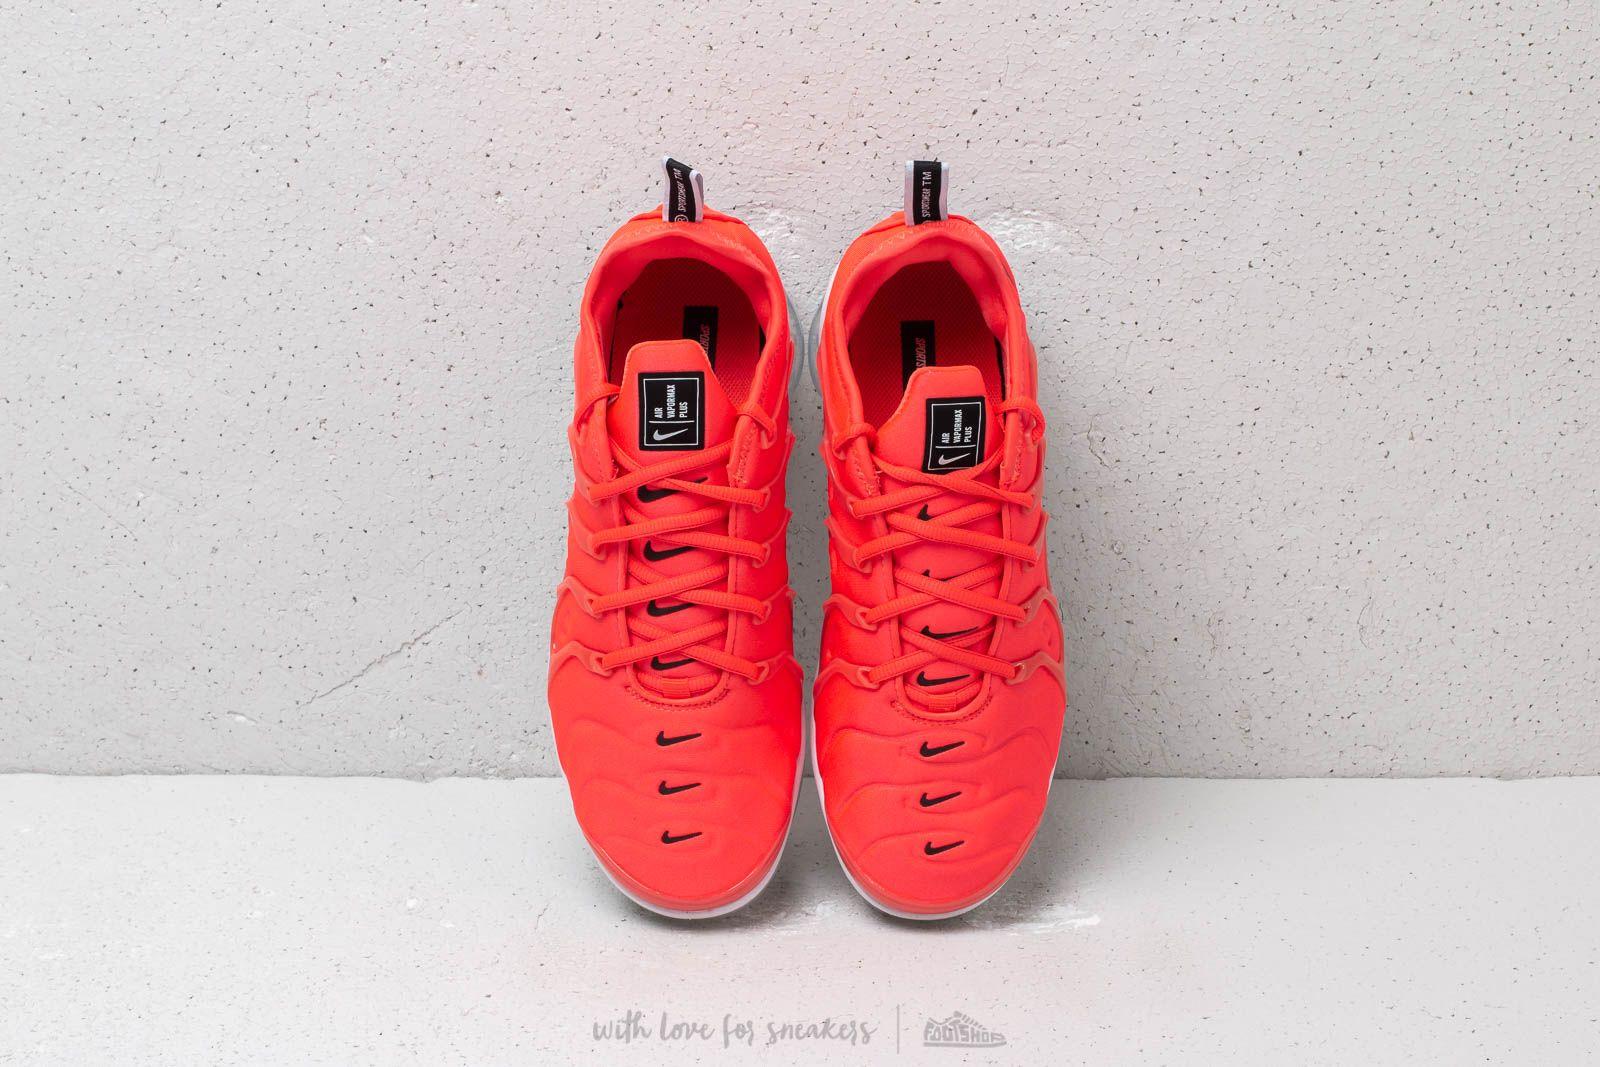 Nike Air Vapormax Plus Bright Crimson Black White   Footshop